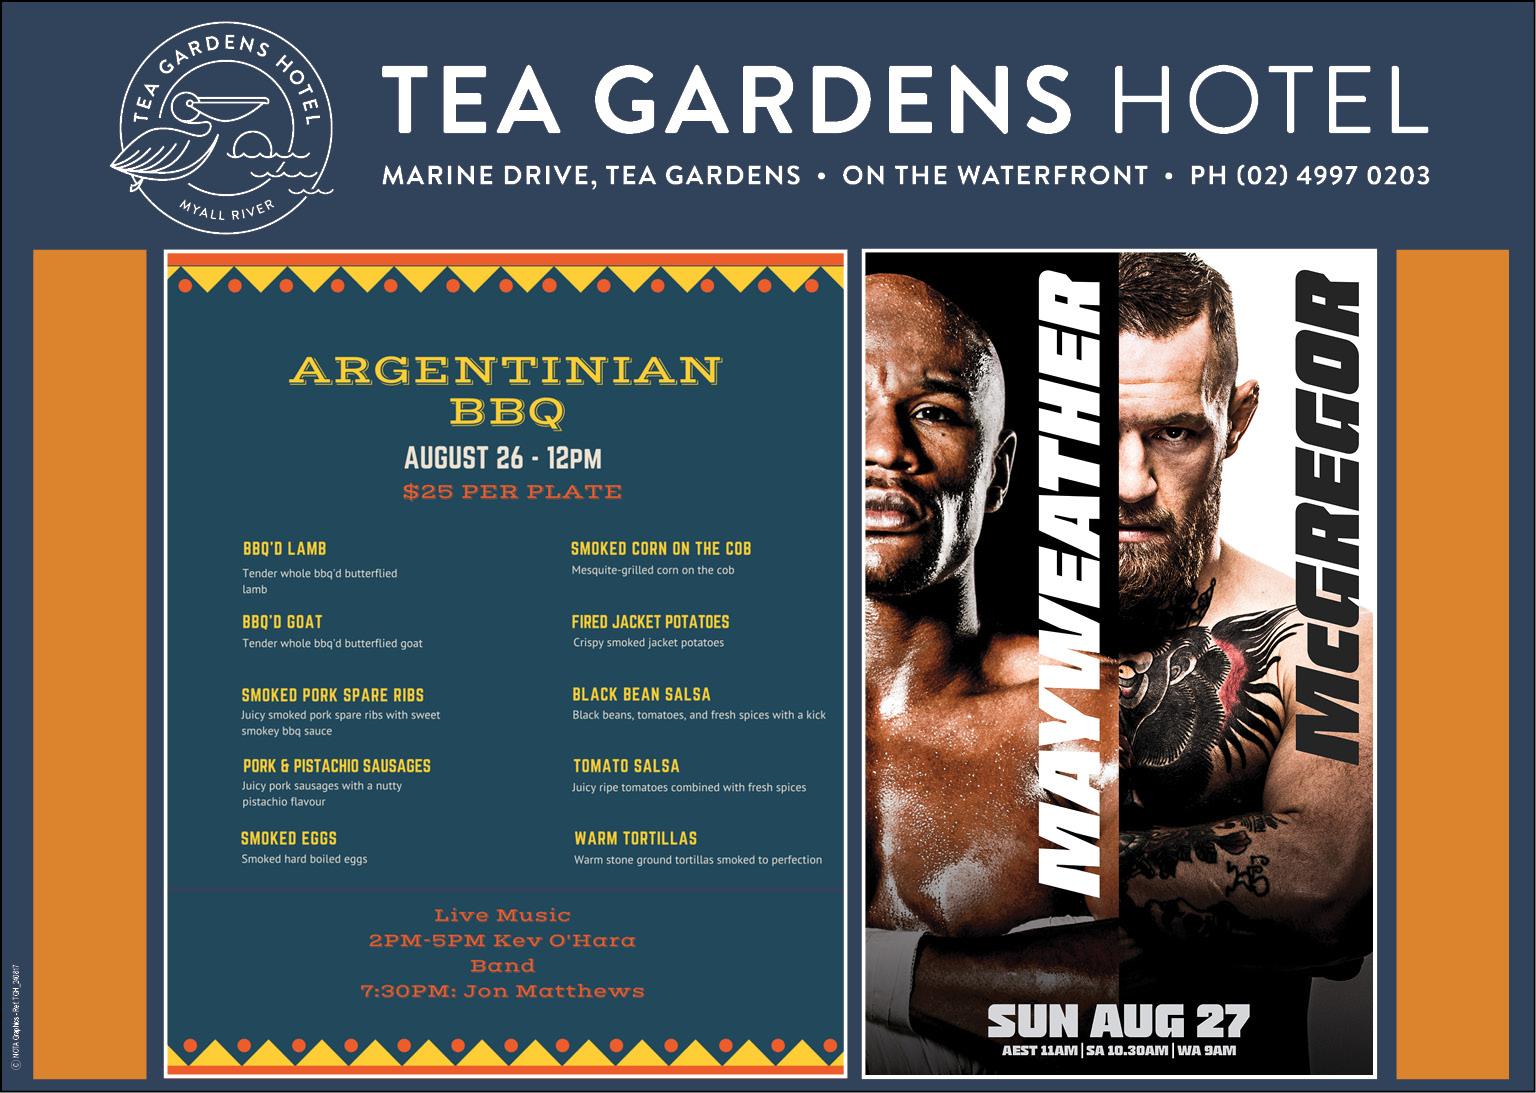 Tea Gardens Hotel